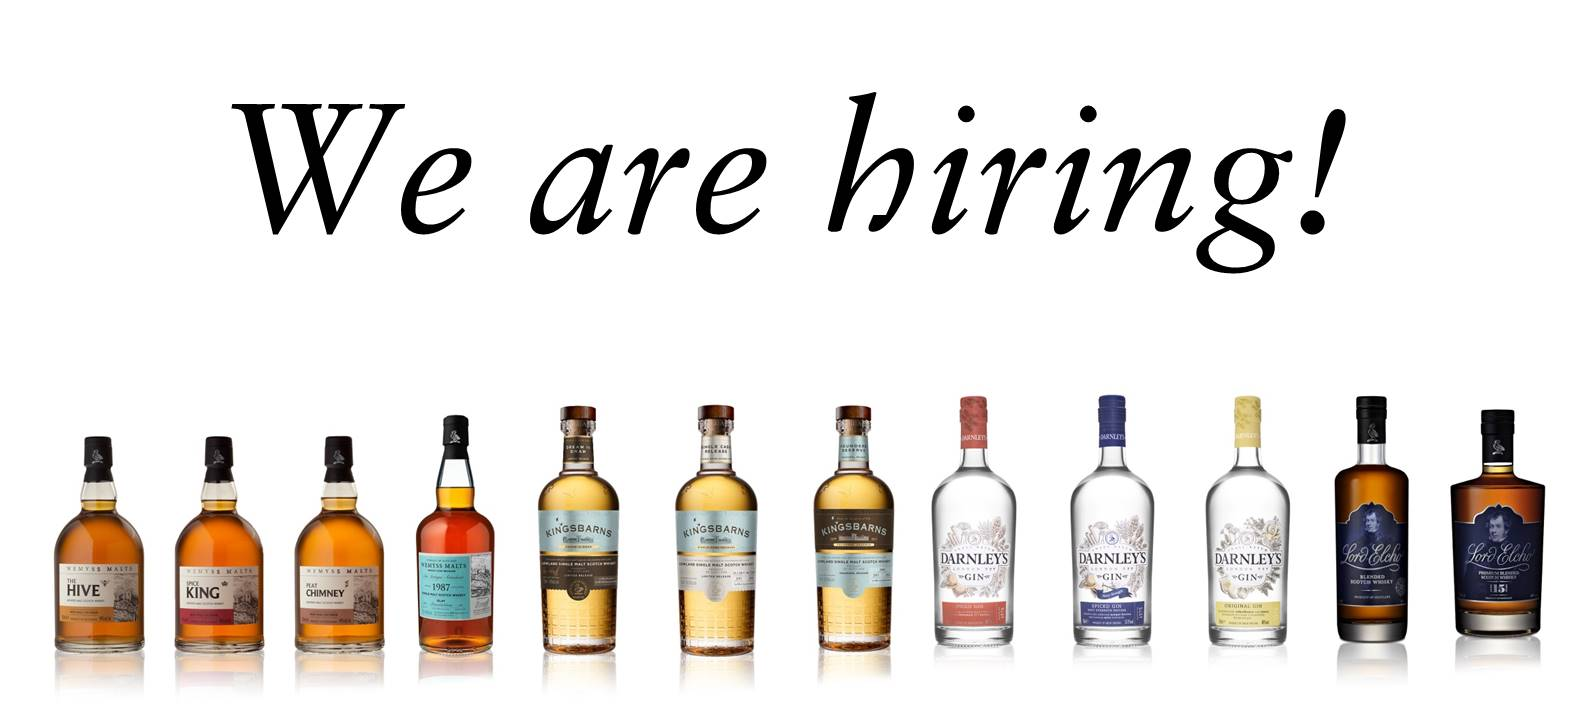 Business Development Manager Job Vacancy In Glasgow Wemyss Malts Wemyss Malts An Adventurous Exploration Of Flavour